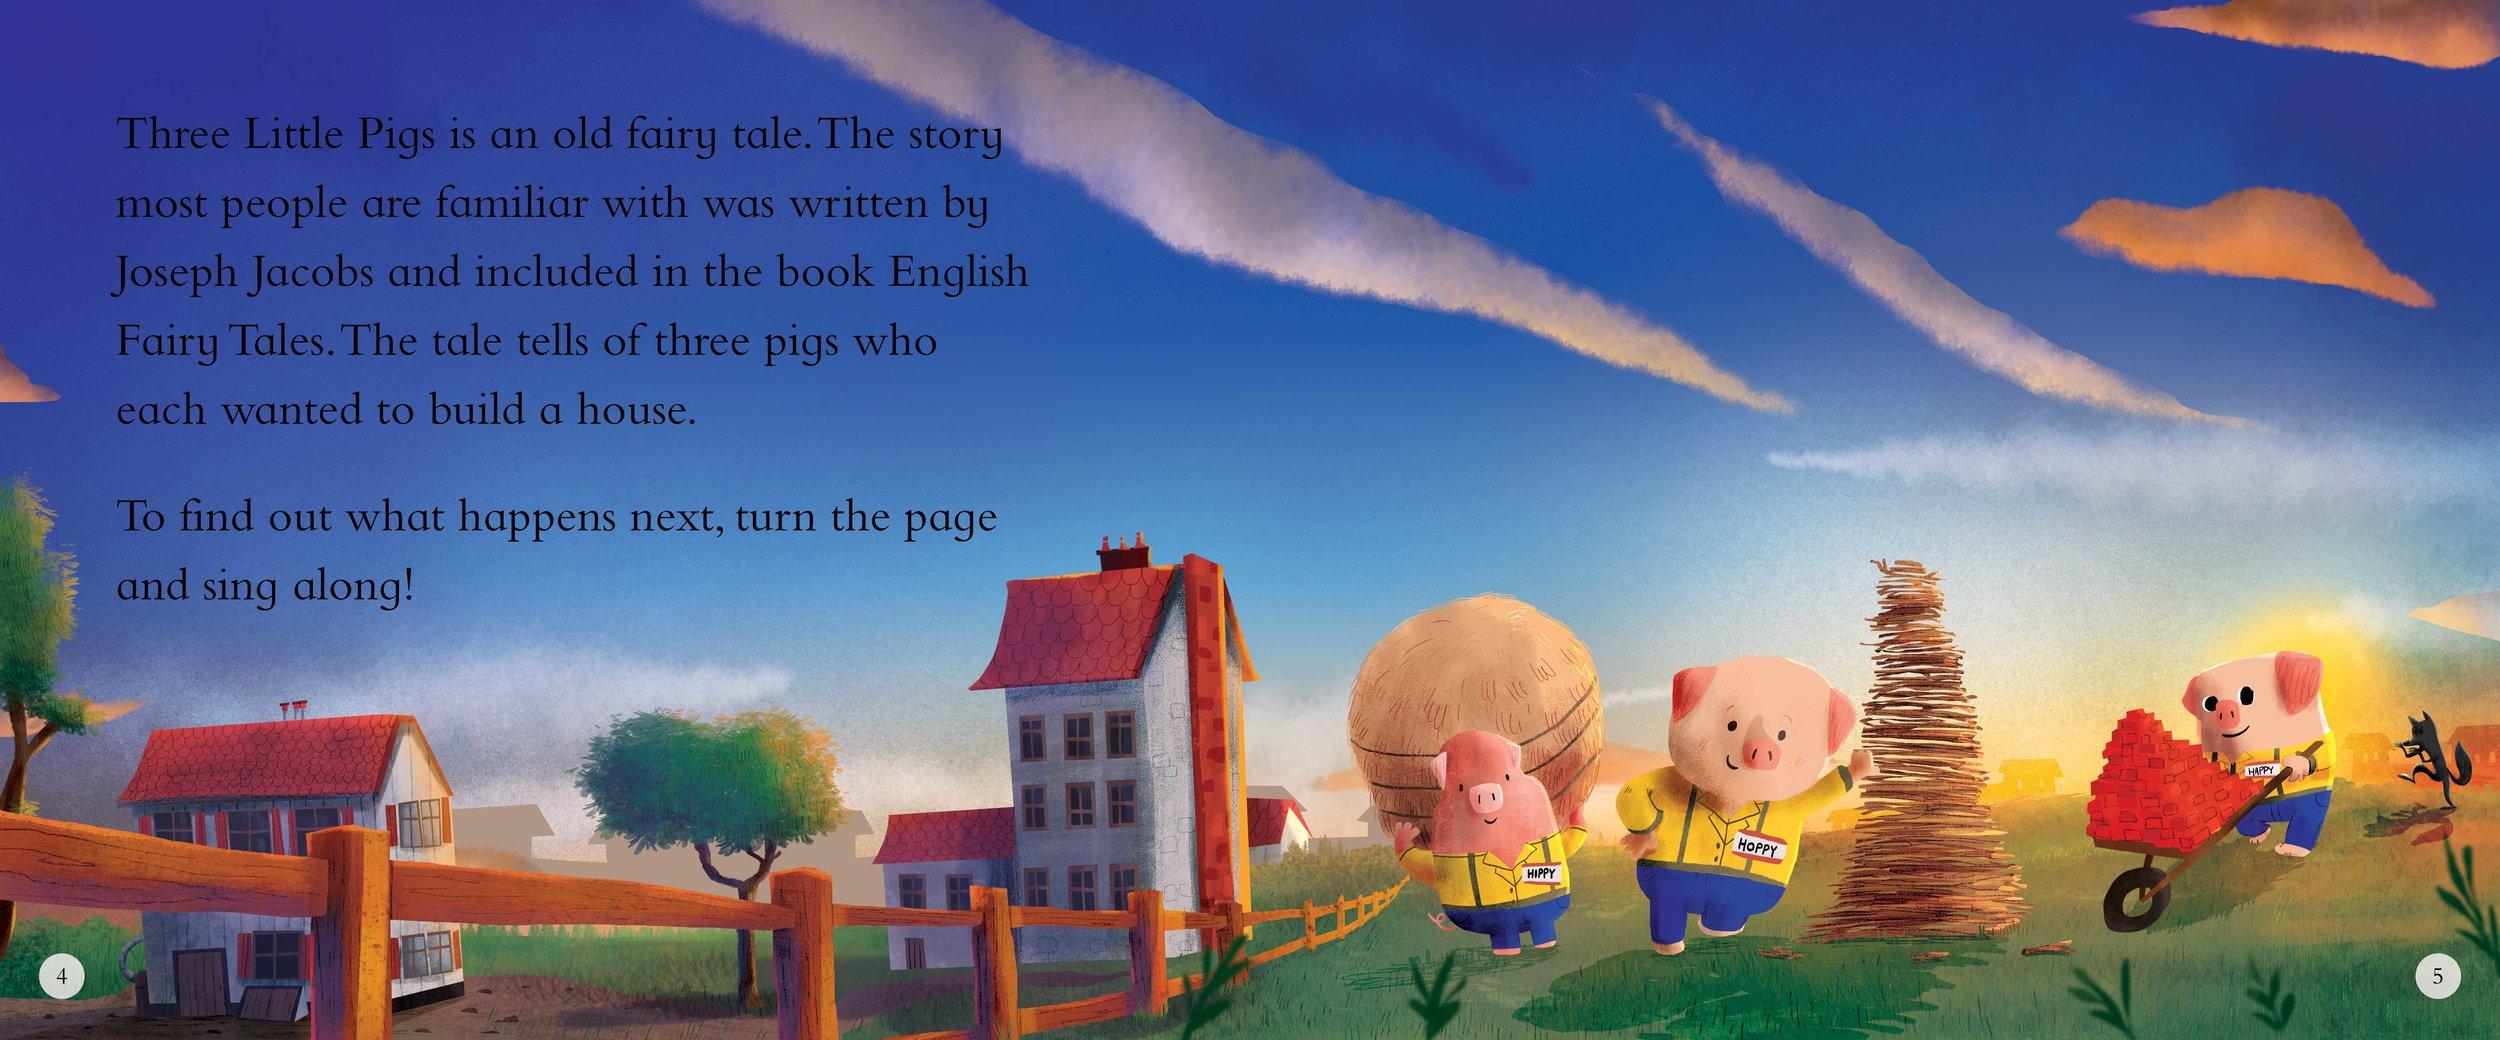 page-1.jpg